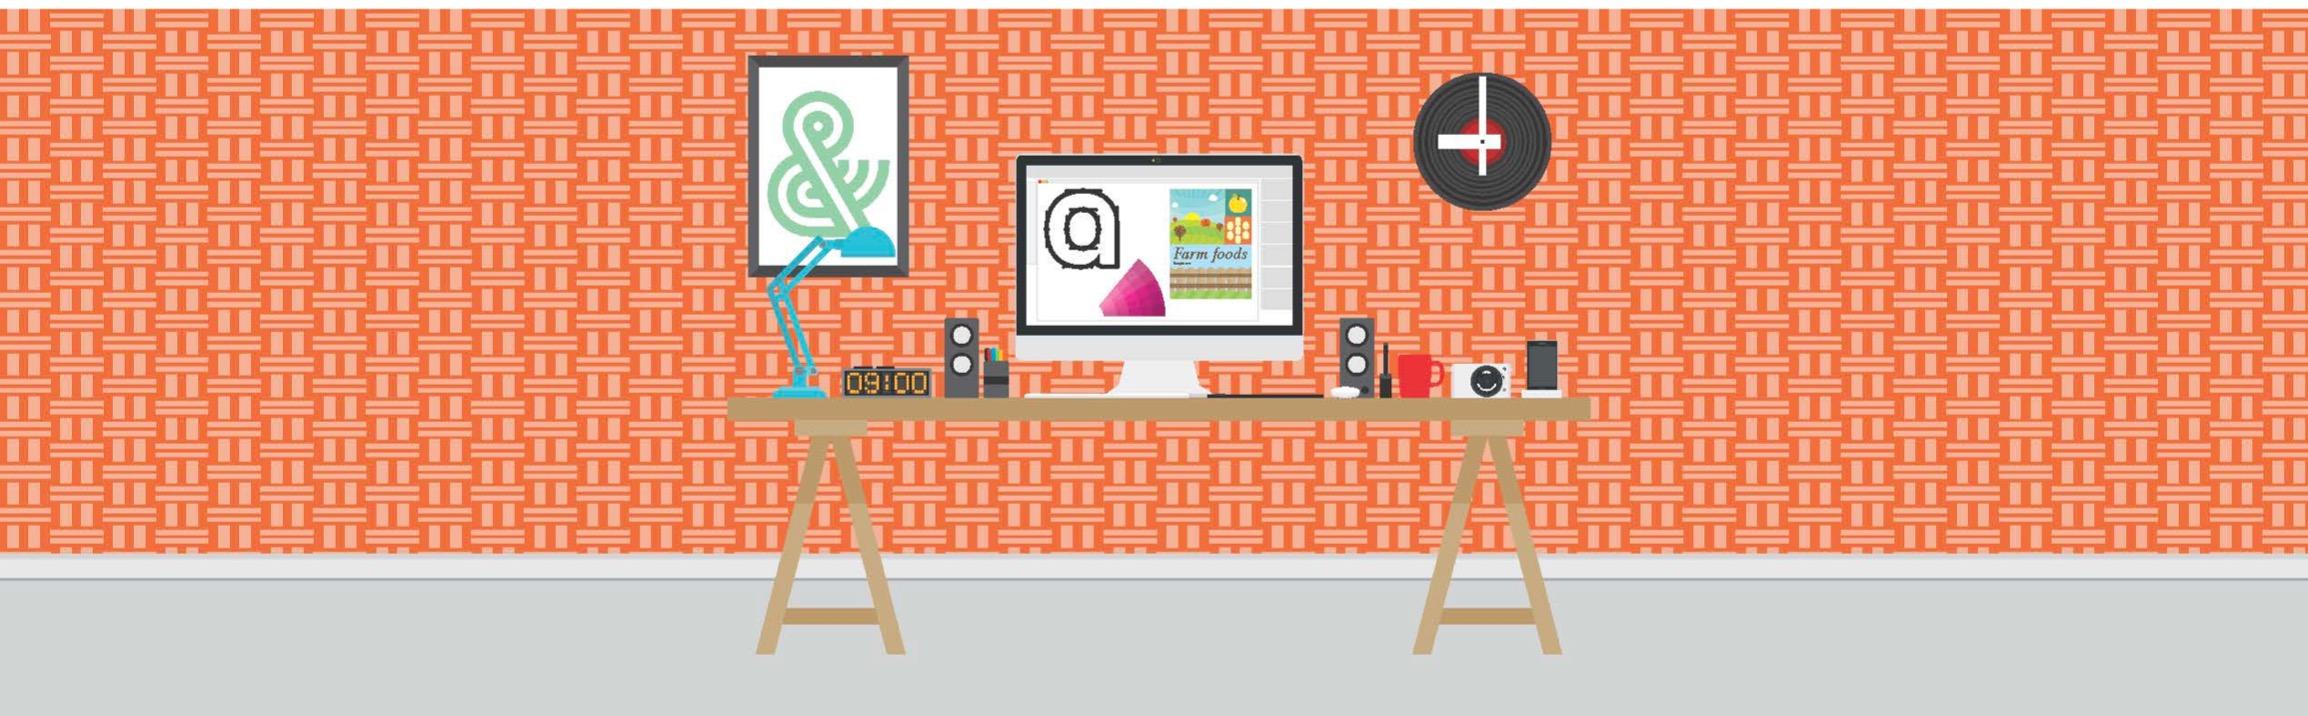 How to Create a Home